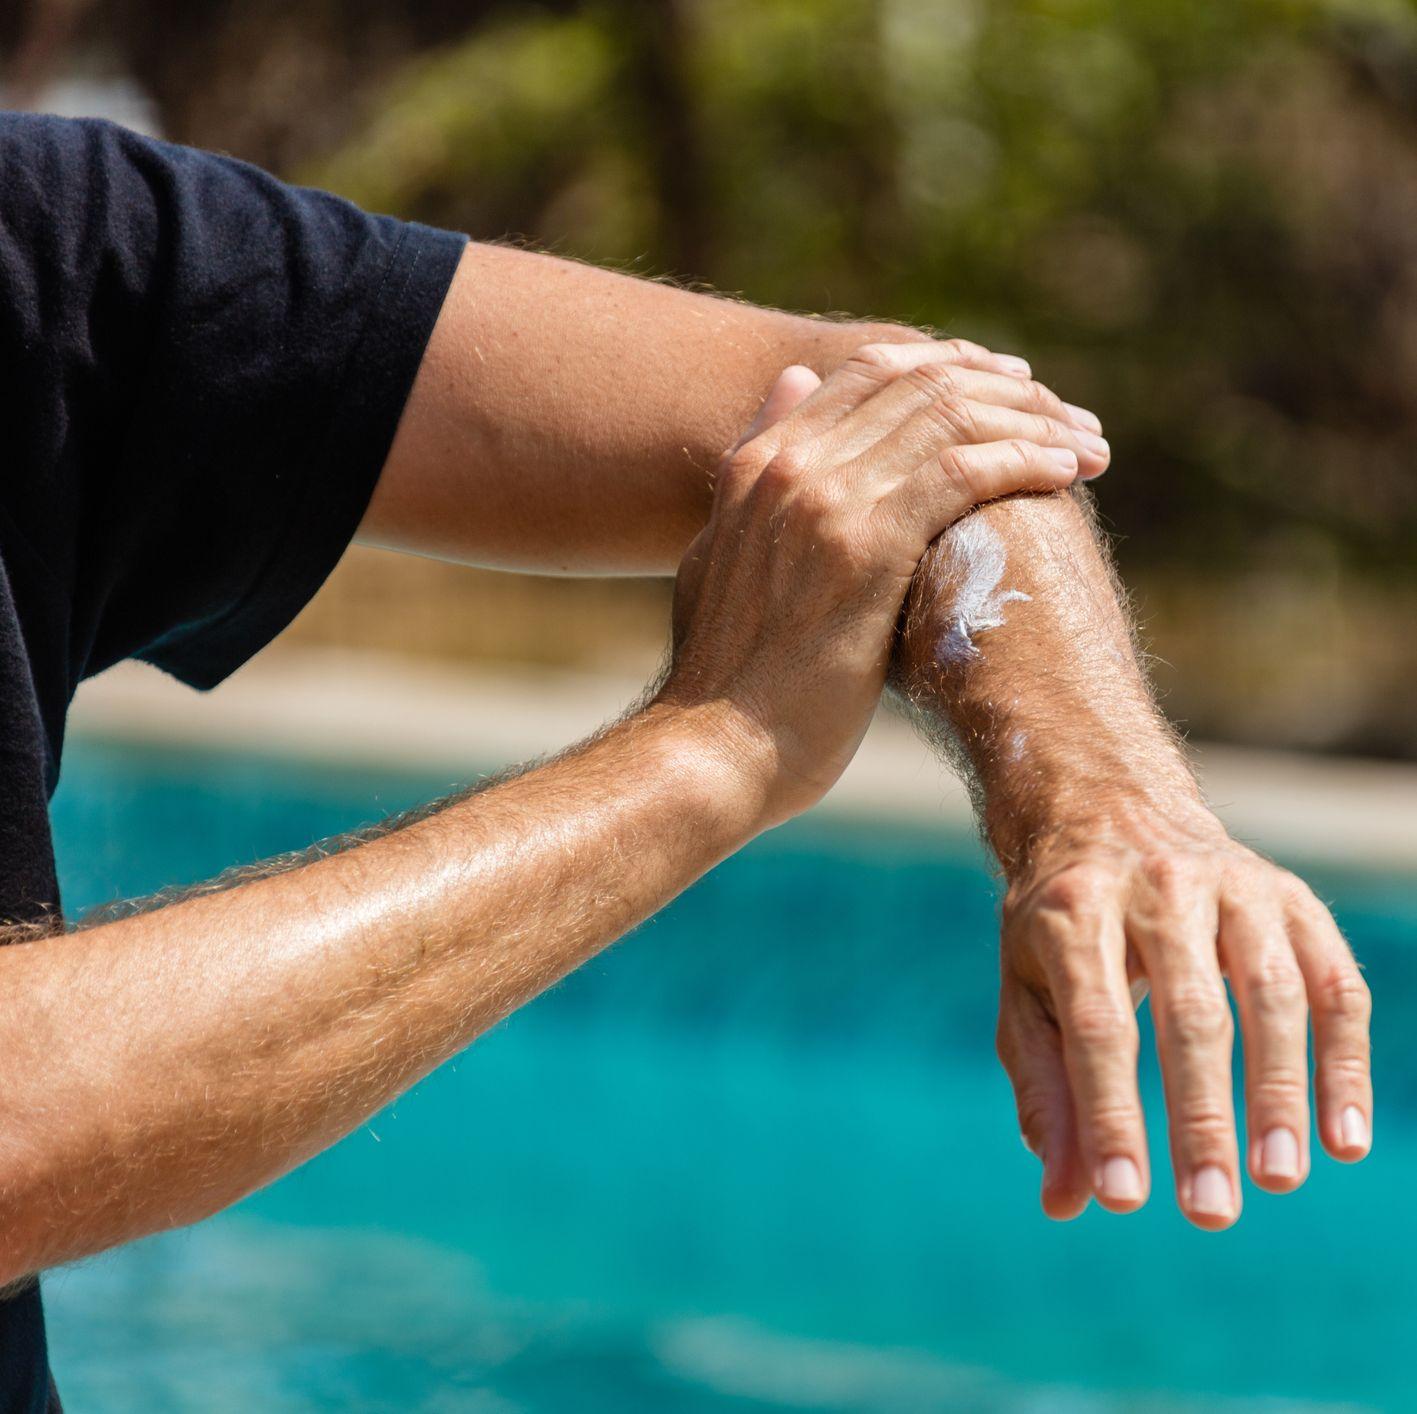 PSA: Homemade Sunscreen Is a Really Terrible Idea